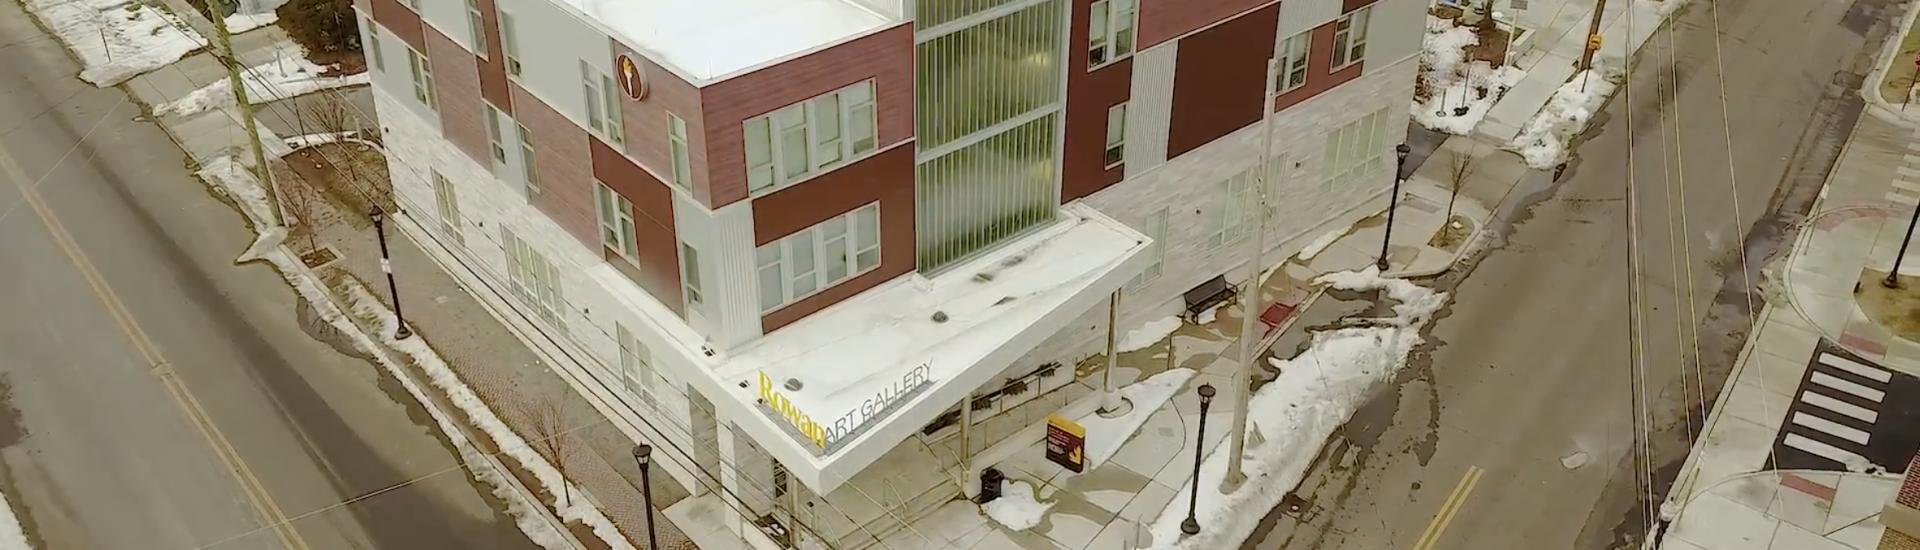 Rowan University 301 High Street Drone Shot